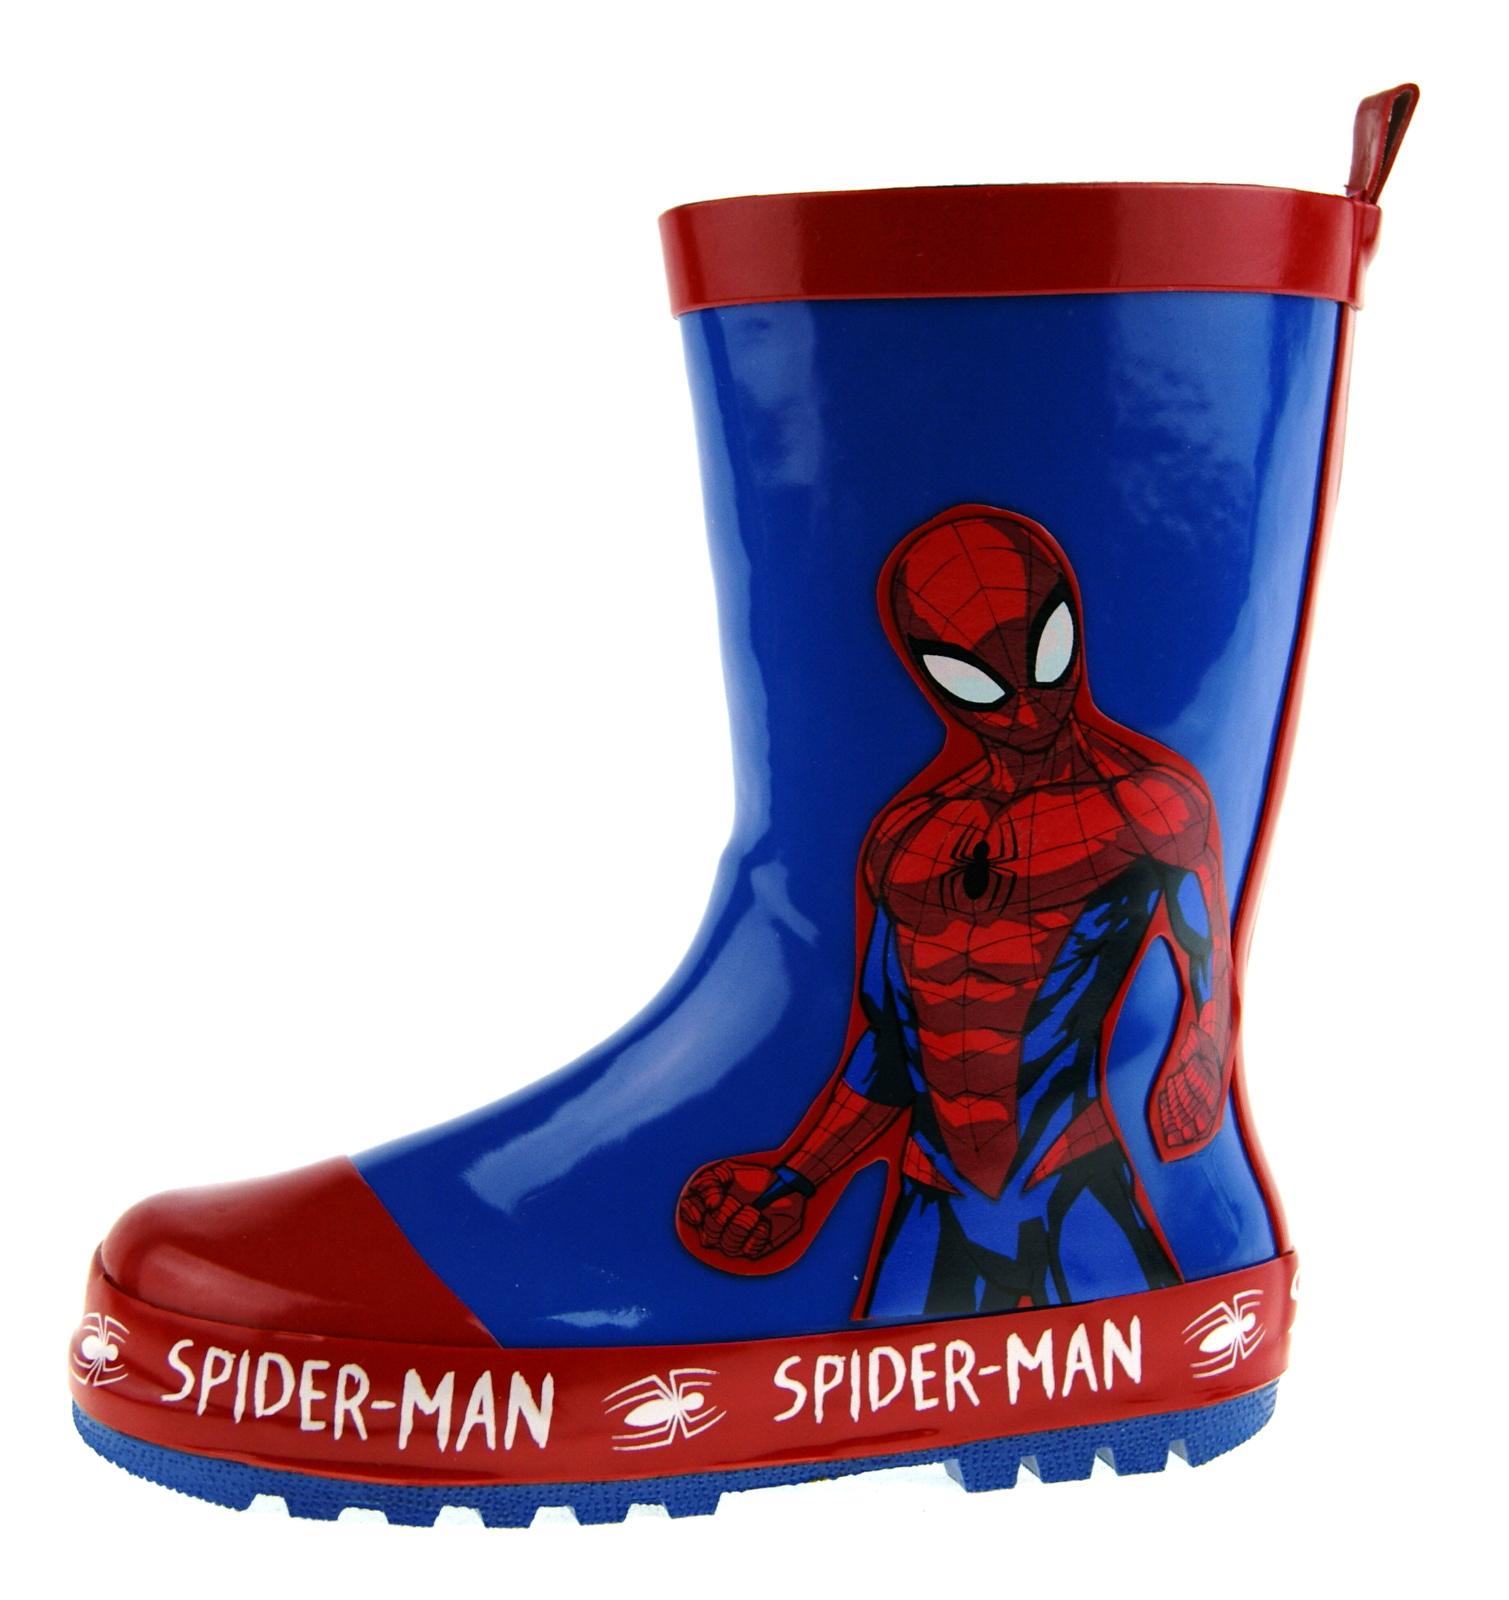 Spiderman Wellington Boots Boys Marvel Superhero Wellies Rubber Snow Boots Size